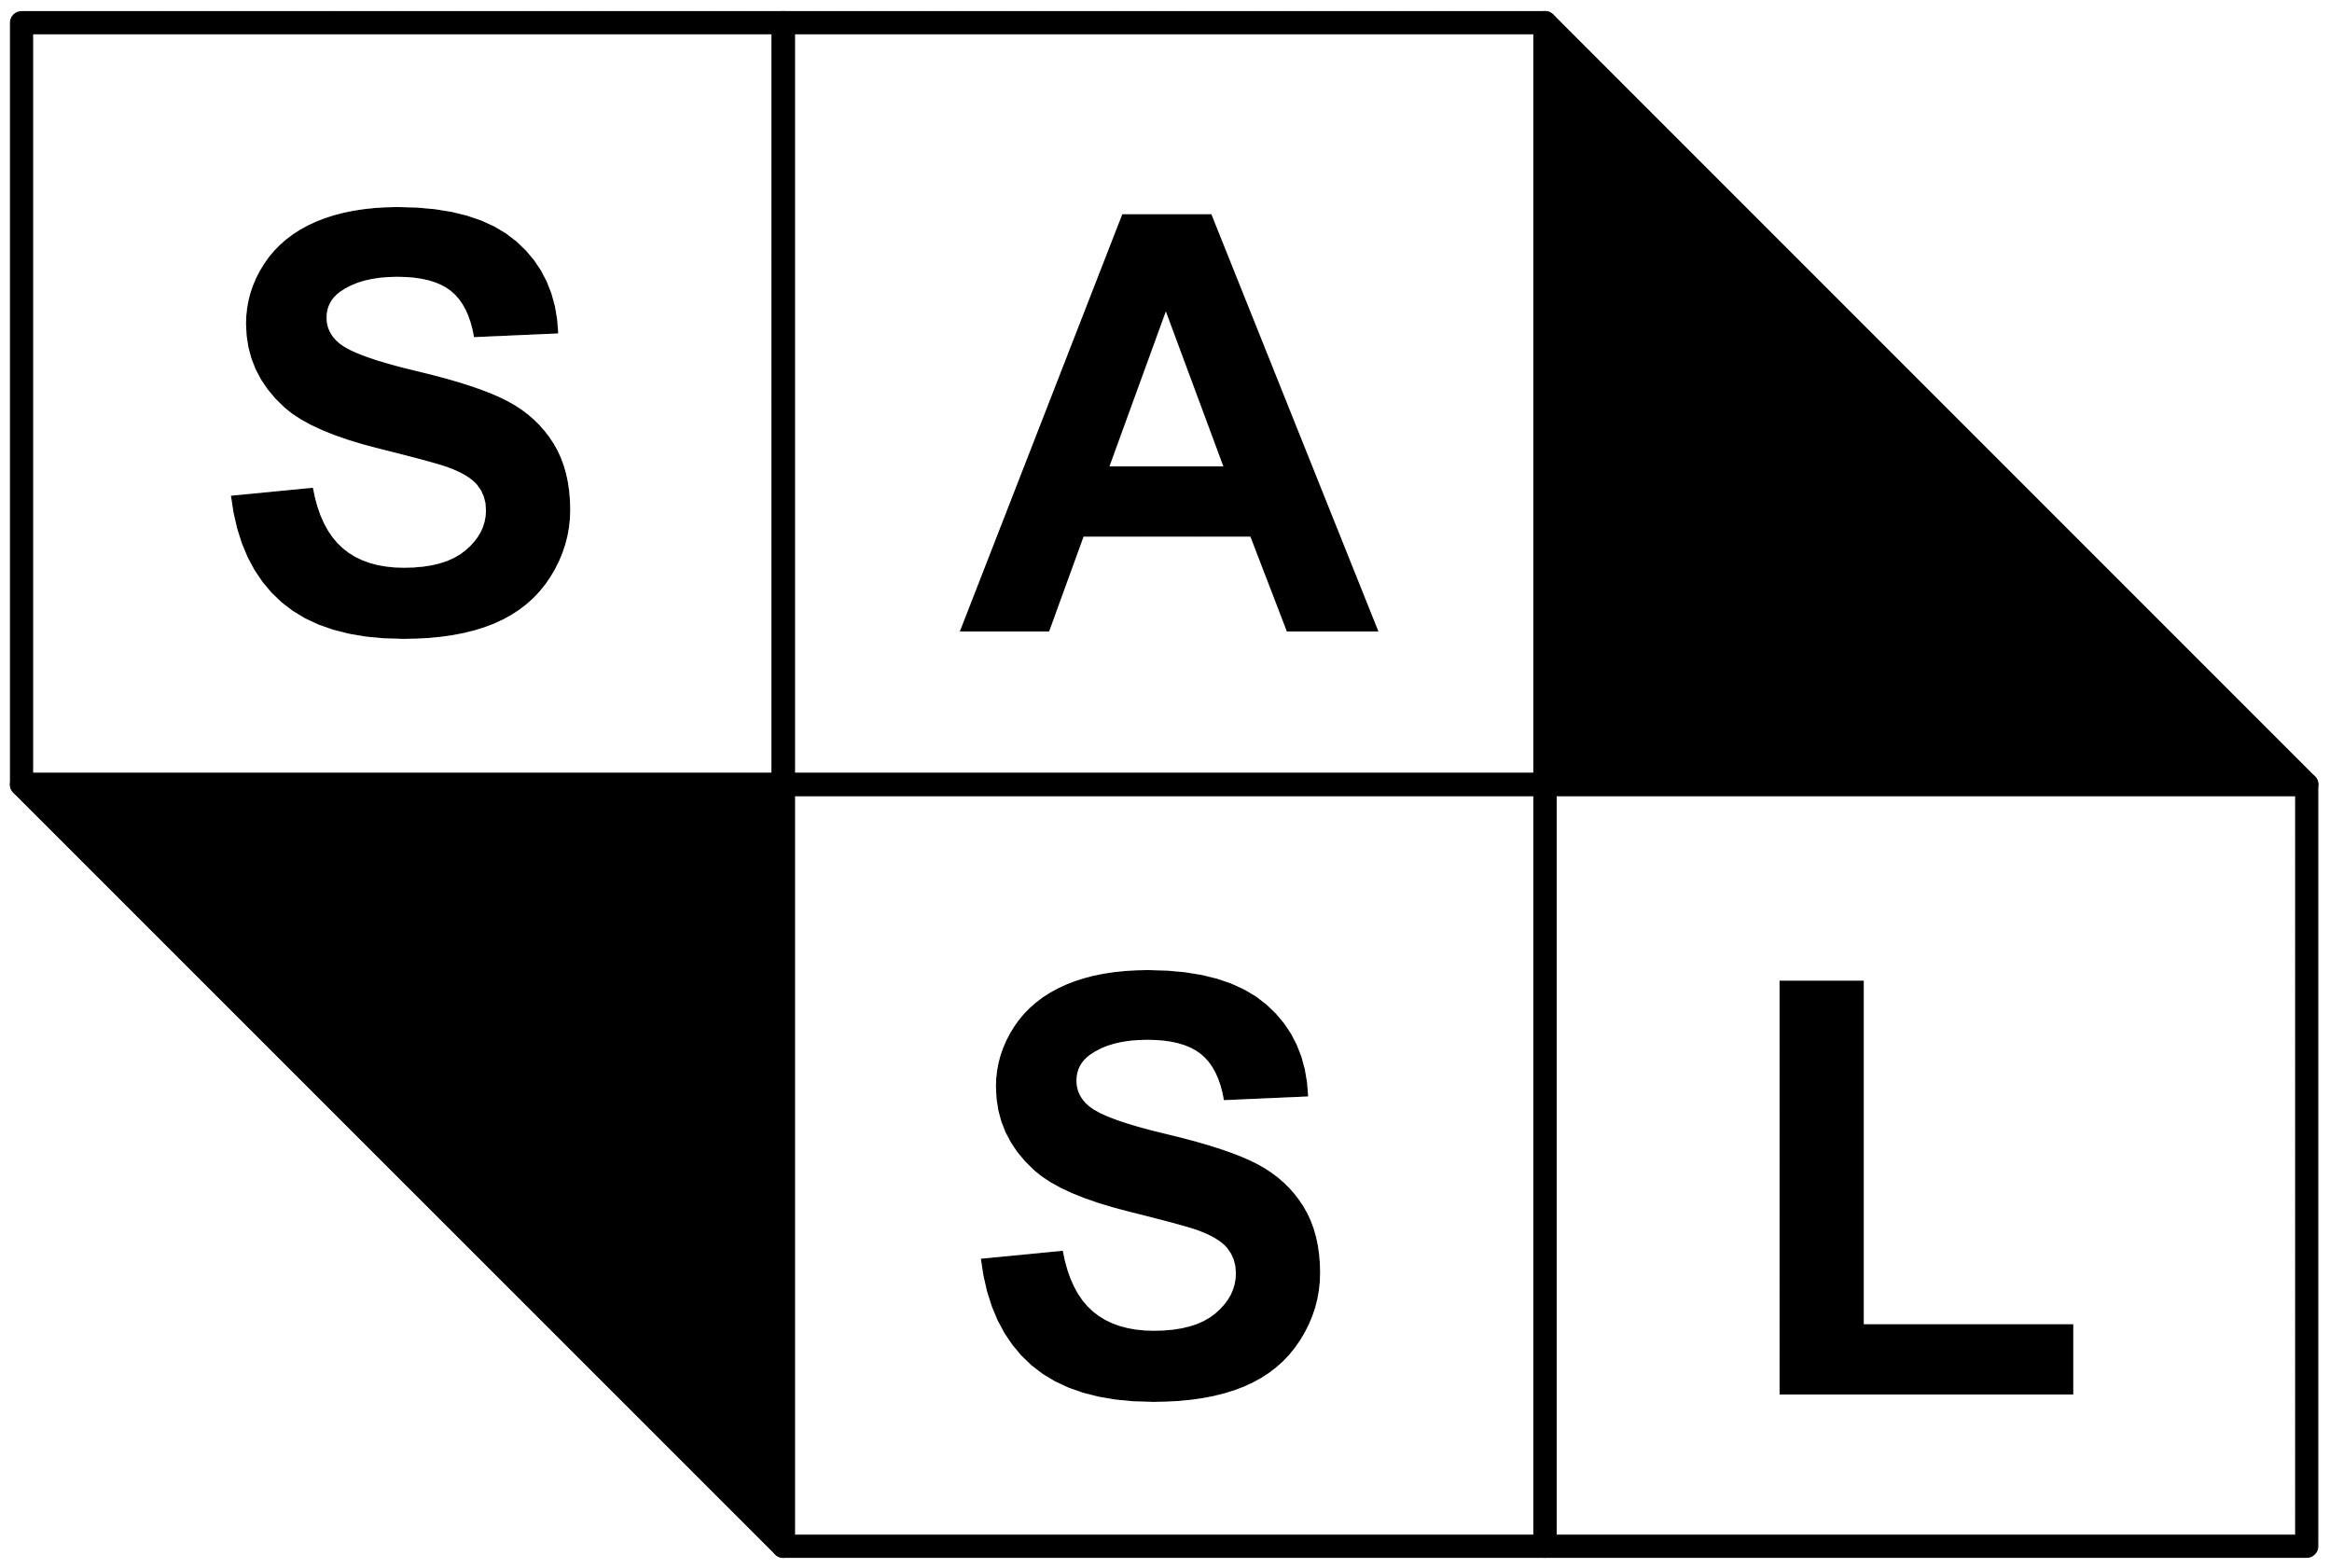 SASL gross